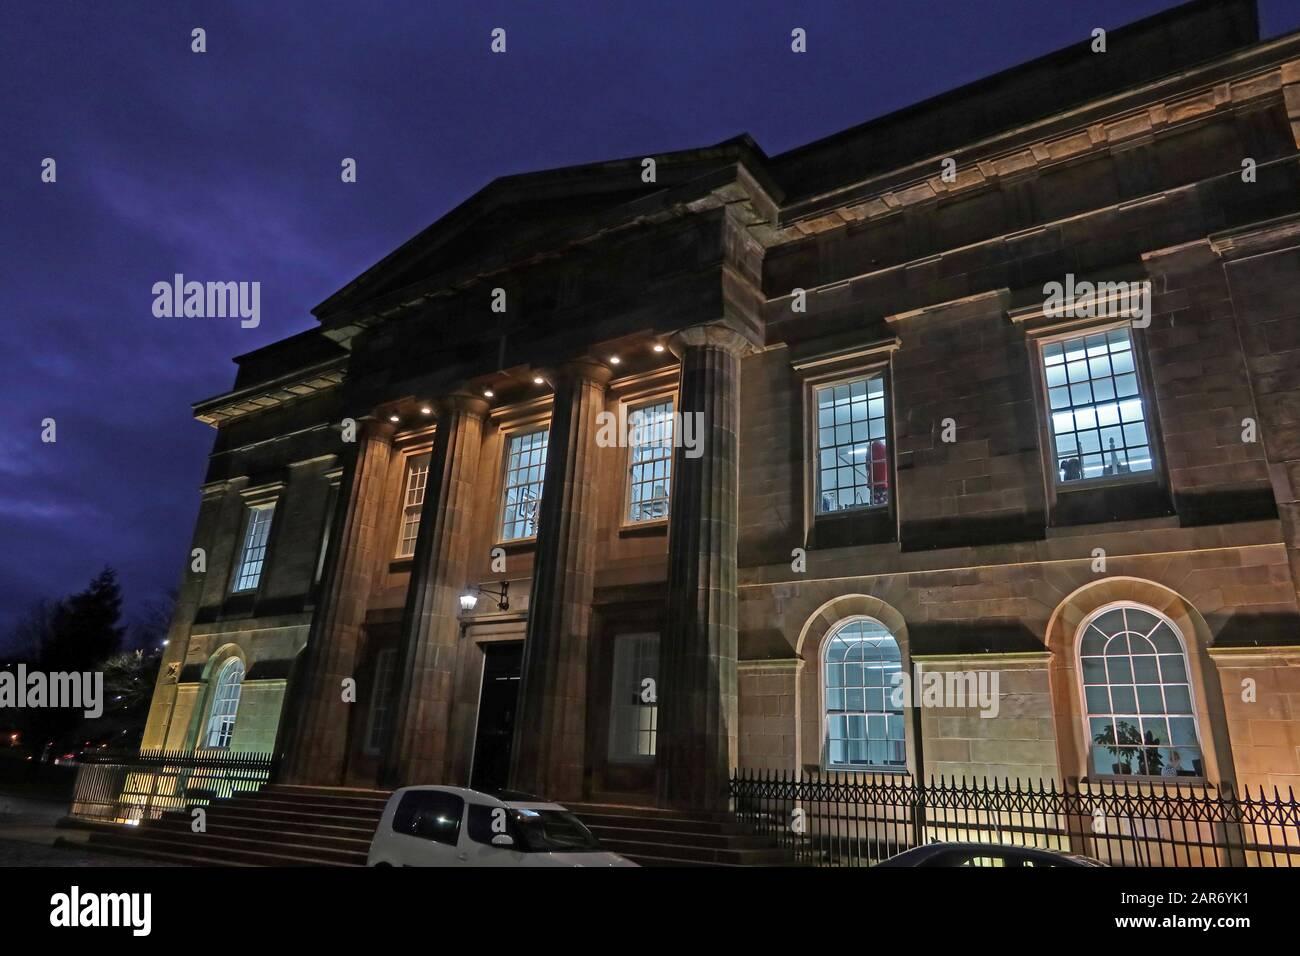 GoTonySmith,HotpixUK,@HotpixUK,Inverclyde,Scotland,West Of Glasgow,West of Scotland,UK,dusk,night,night time,tail of the bank,Inverclyde Council,buildings,Historic,history,historic building,custom house port,port,Customhouse Quay,Clyde,Clydeside,Greenockians